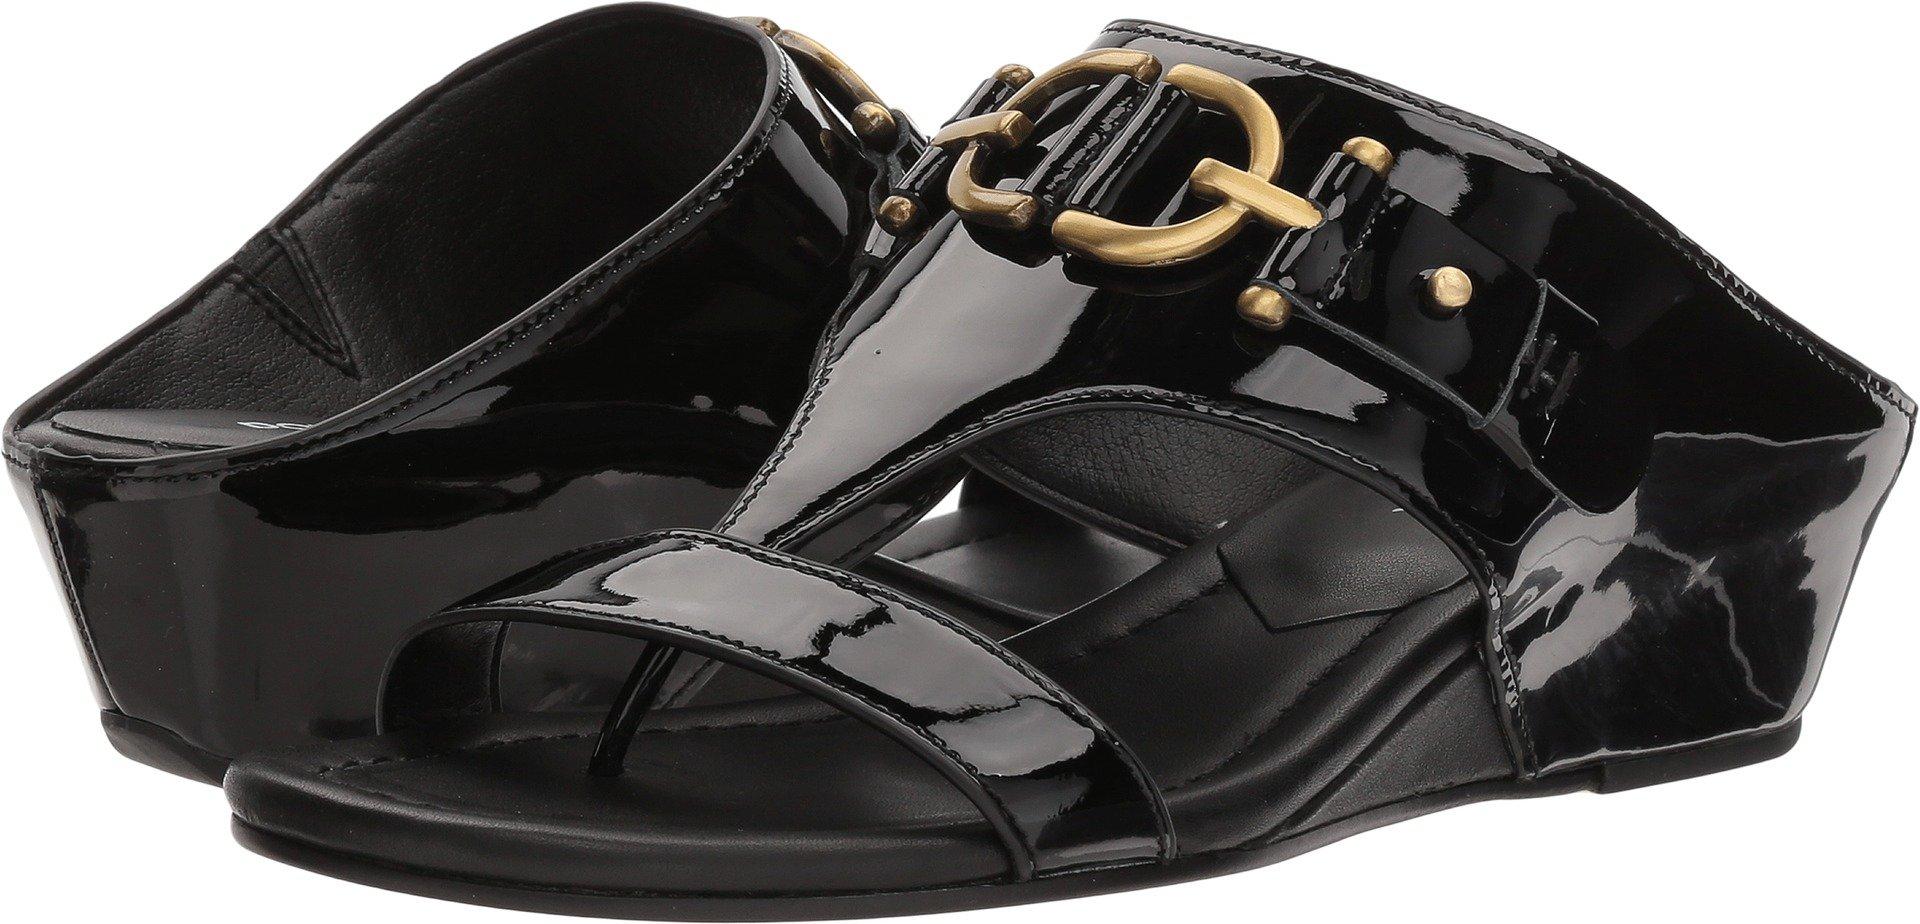 Donald J Pliner Women's Dayna Wedge Sandal, Black, 7.5 Medium US